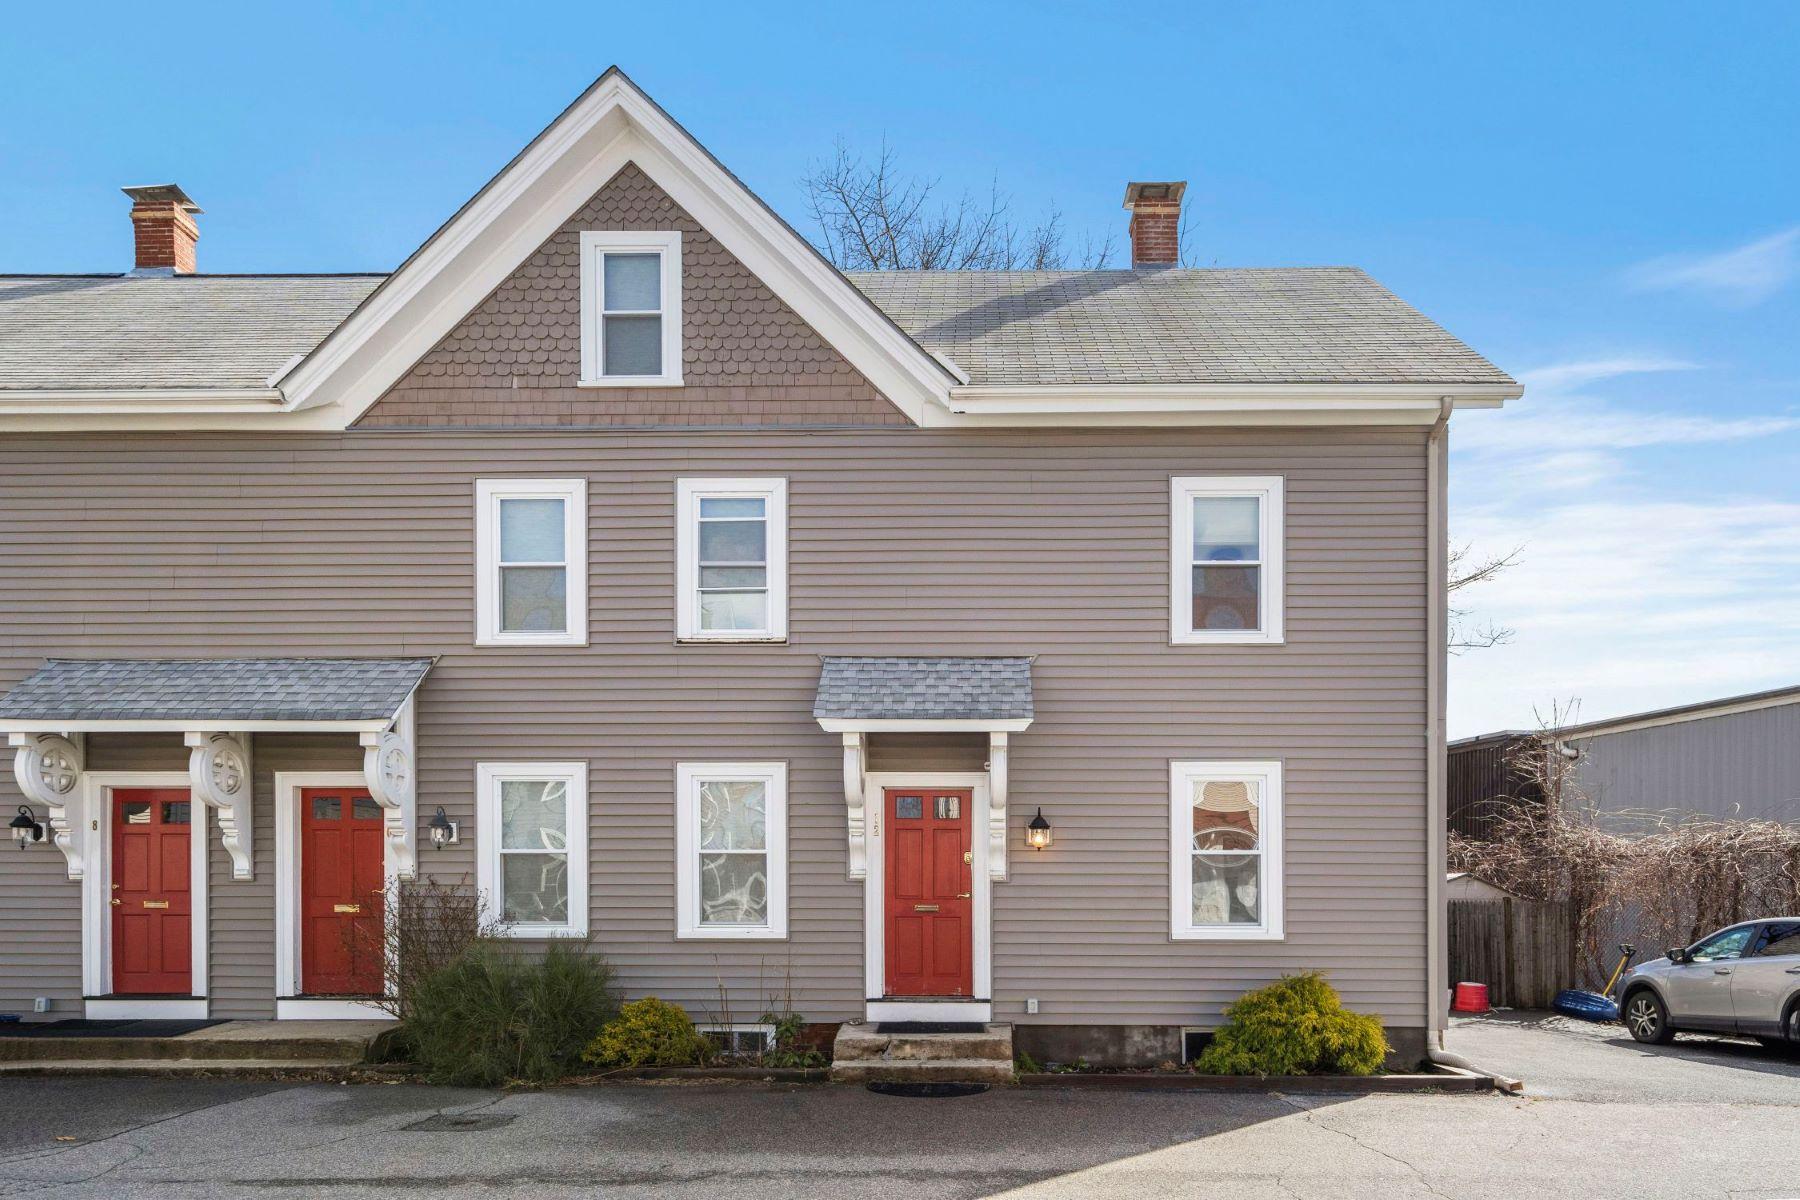 townhouses 为 销售 在 Gorgeous Watertown Townhome 12 Swetts Court Unit 12 沃特敦, 马萨诸塞州 02472 美国